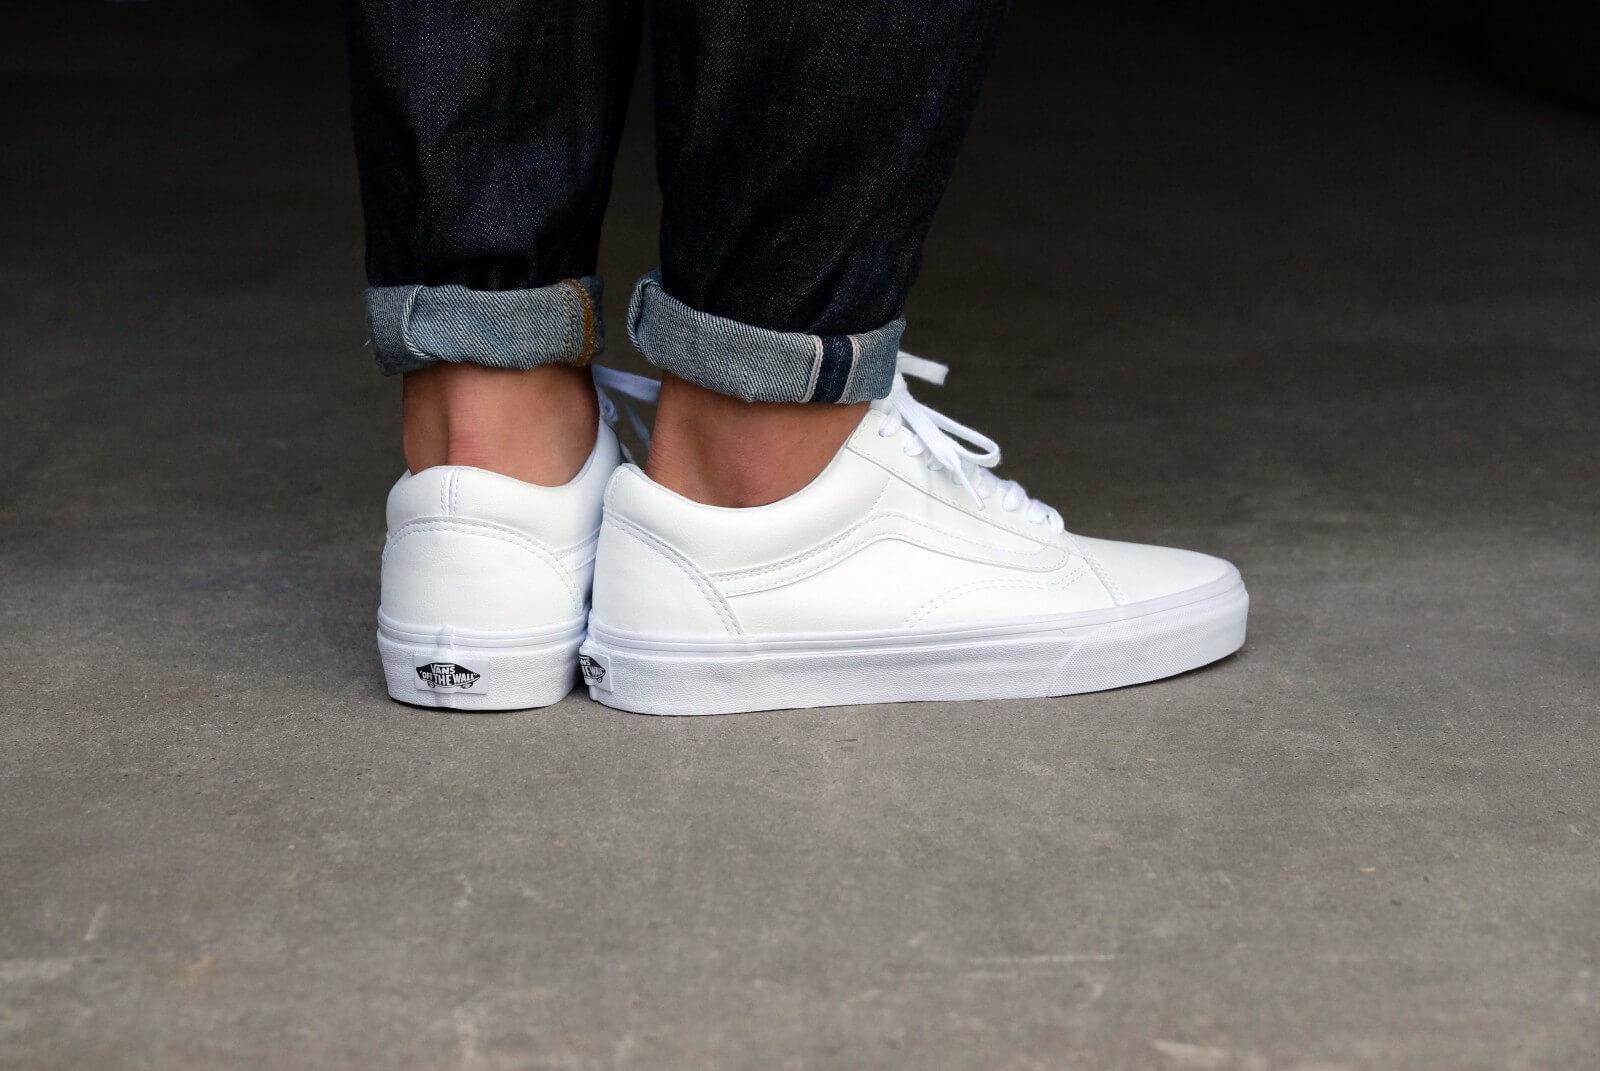 Blanc sneakers Vans Ua Old Skool Classic Tumble Truewhite